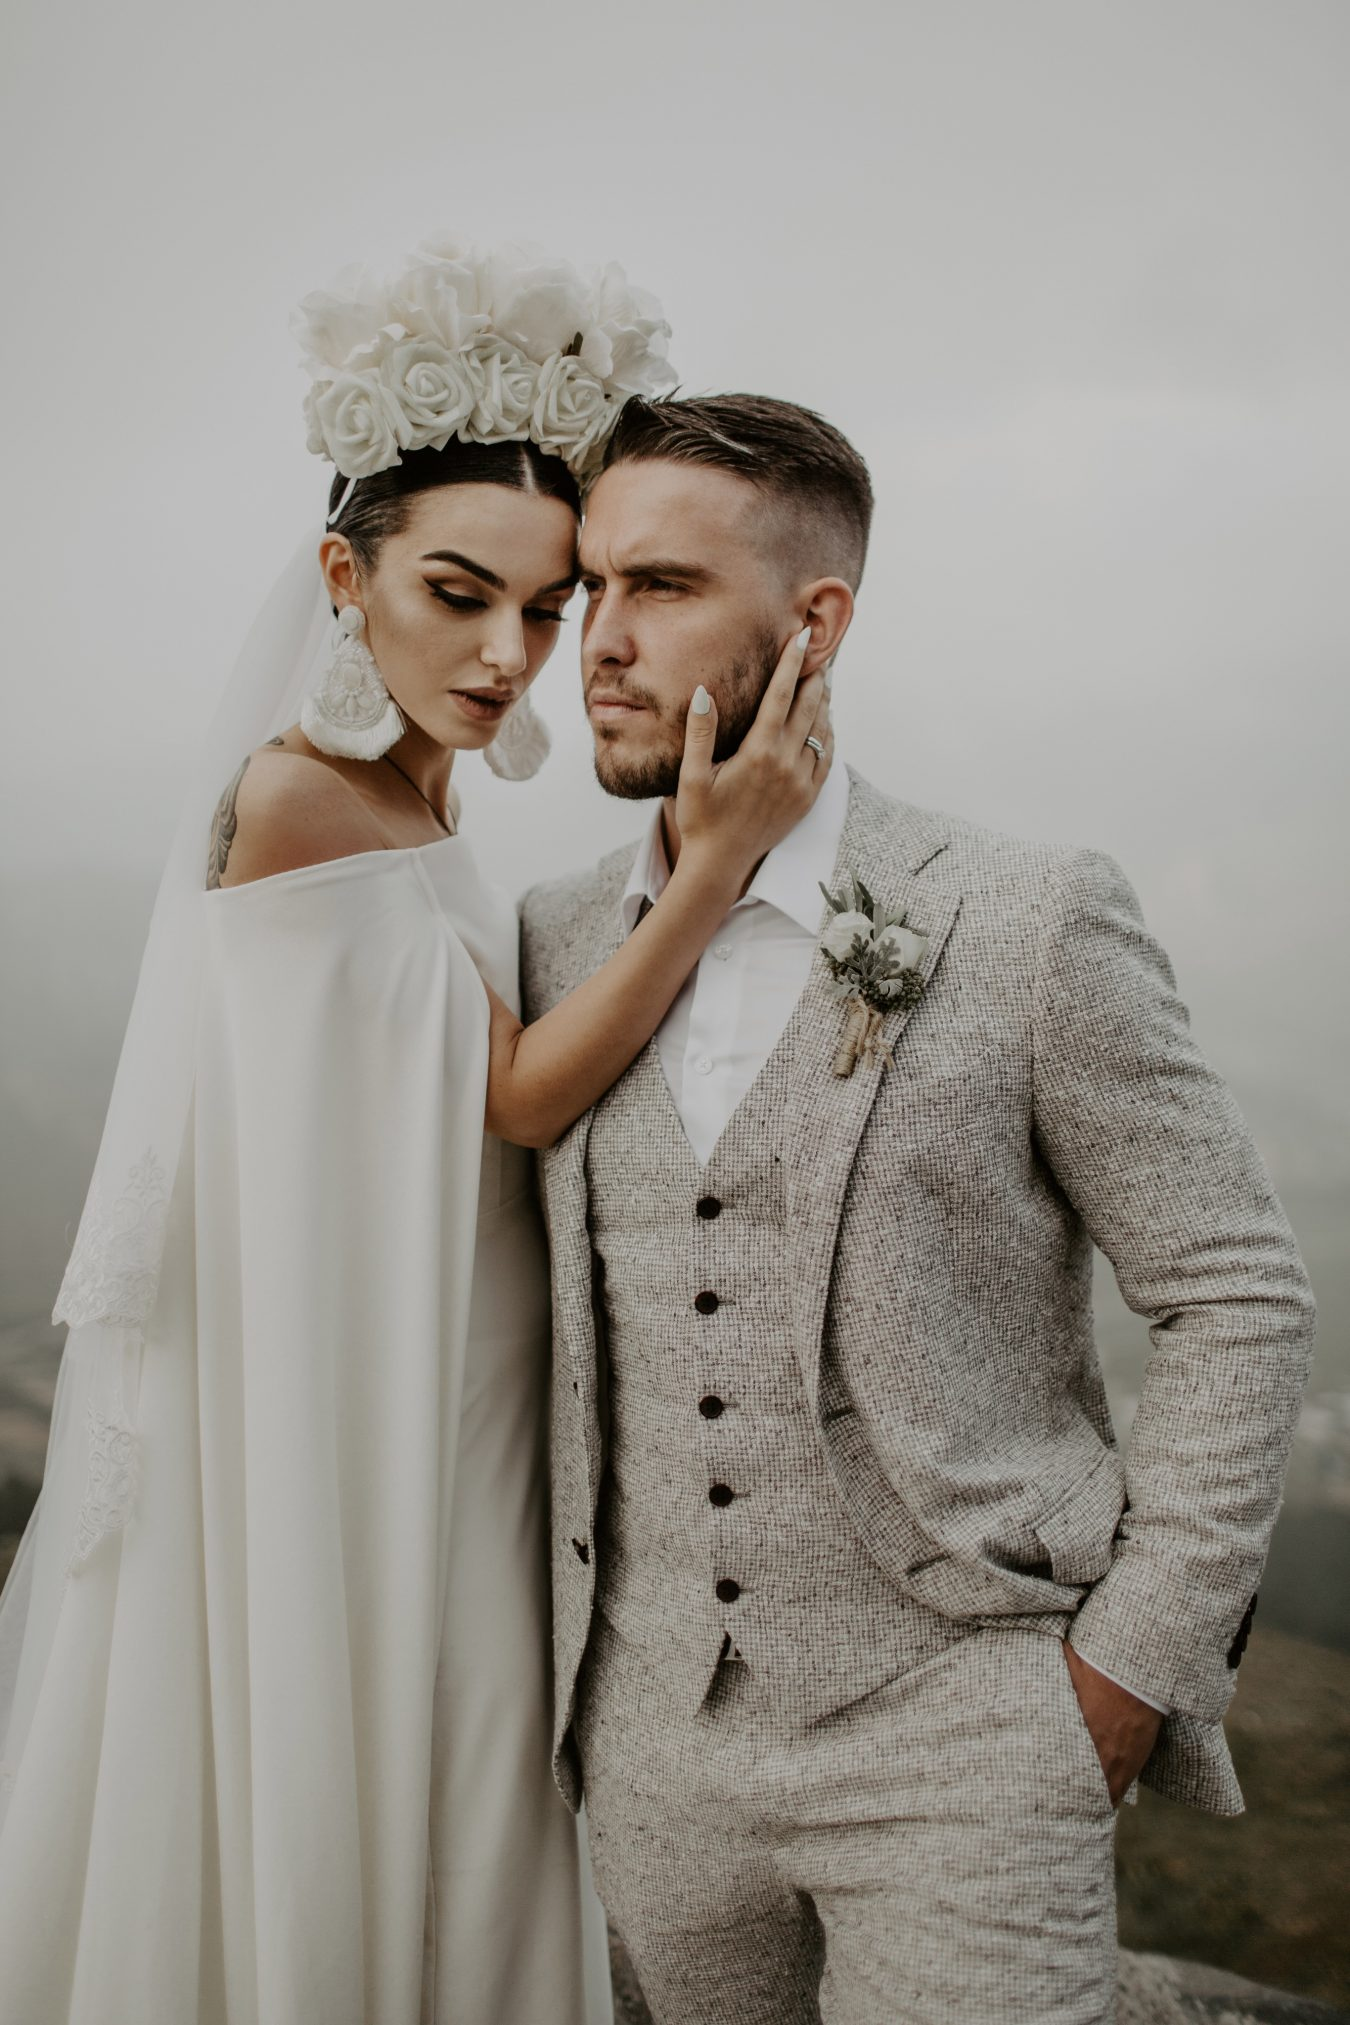 Khatia and Andrew wedding portrait